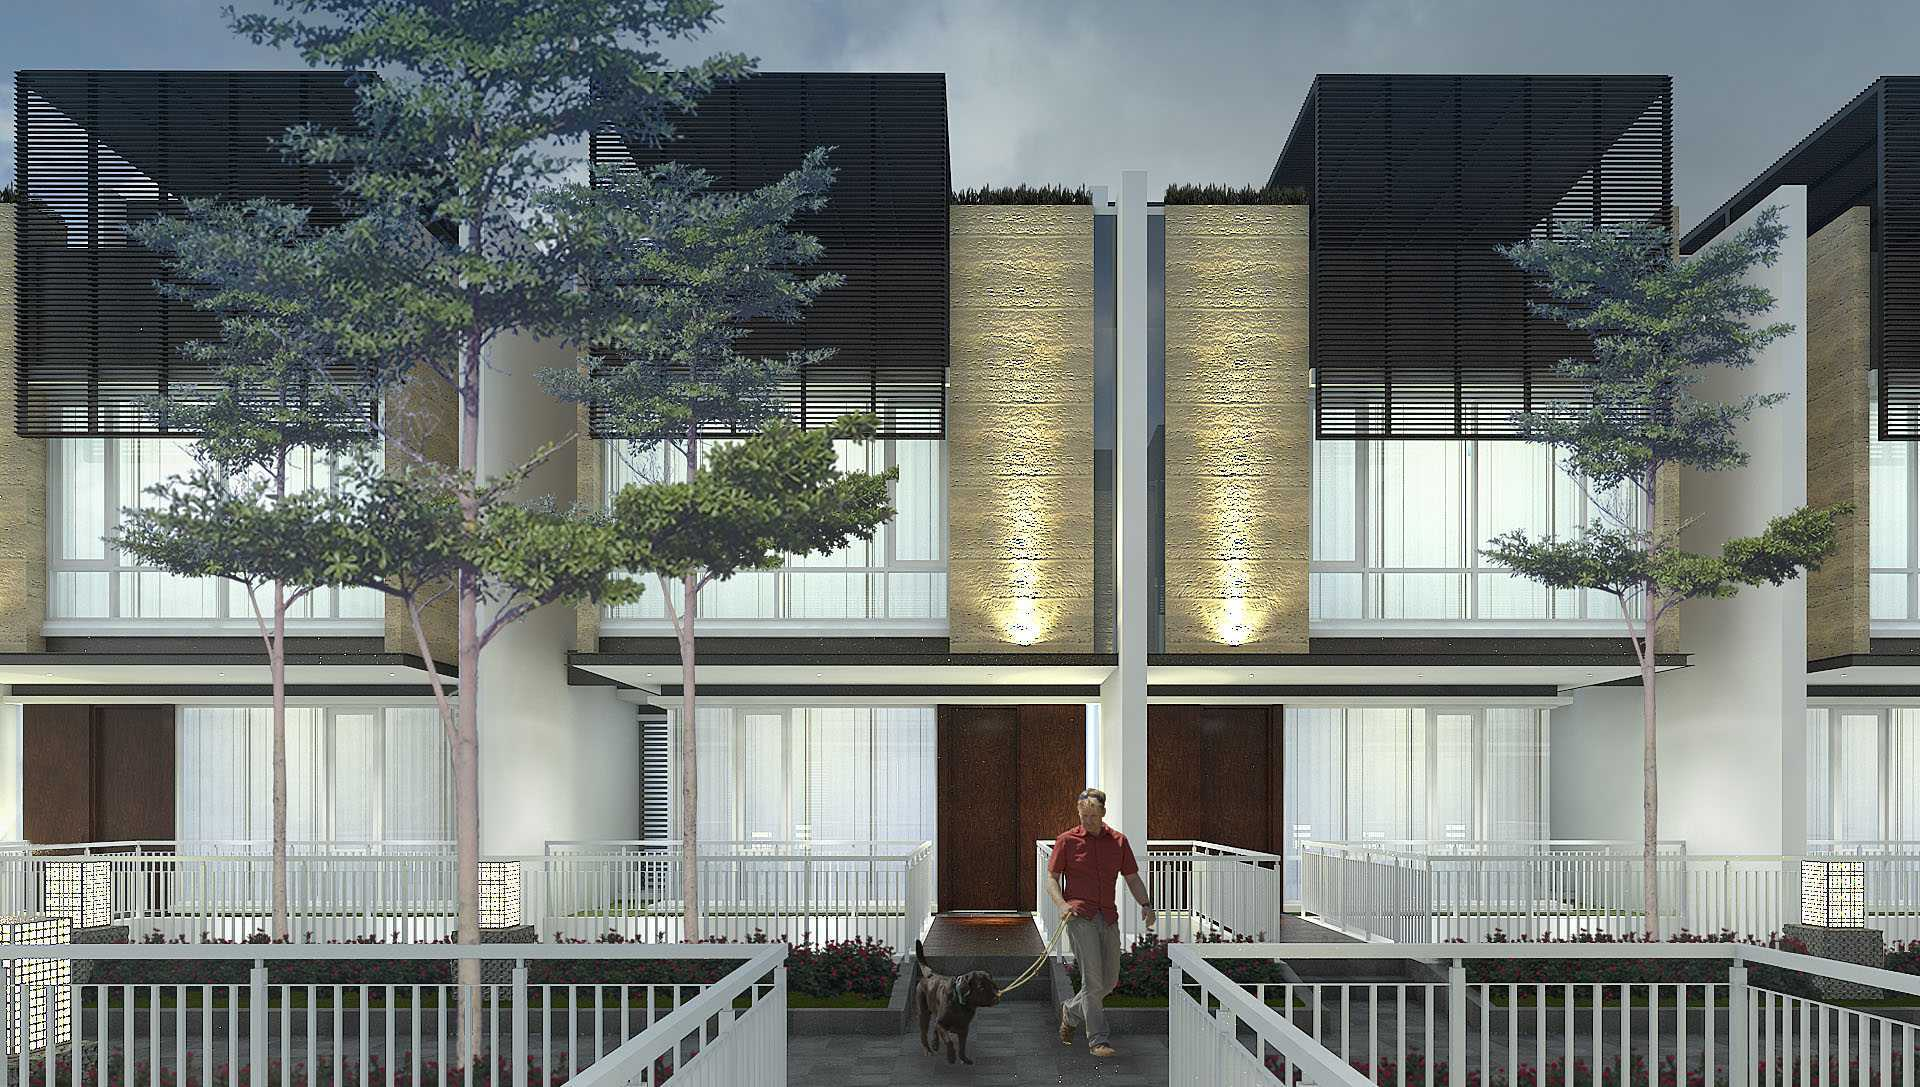 Pj Architects P11 House Karang Tengah, Kota Tangerang, Banten, Indonesia Karang Tengah, Kota Tangerang, Banten, Indonesia Perezjanuar-Architects-P11-House  55579